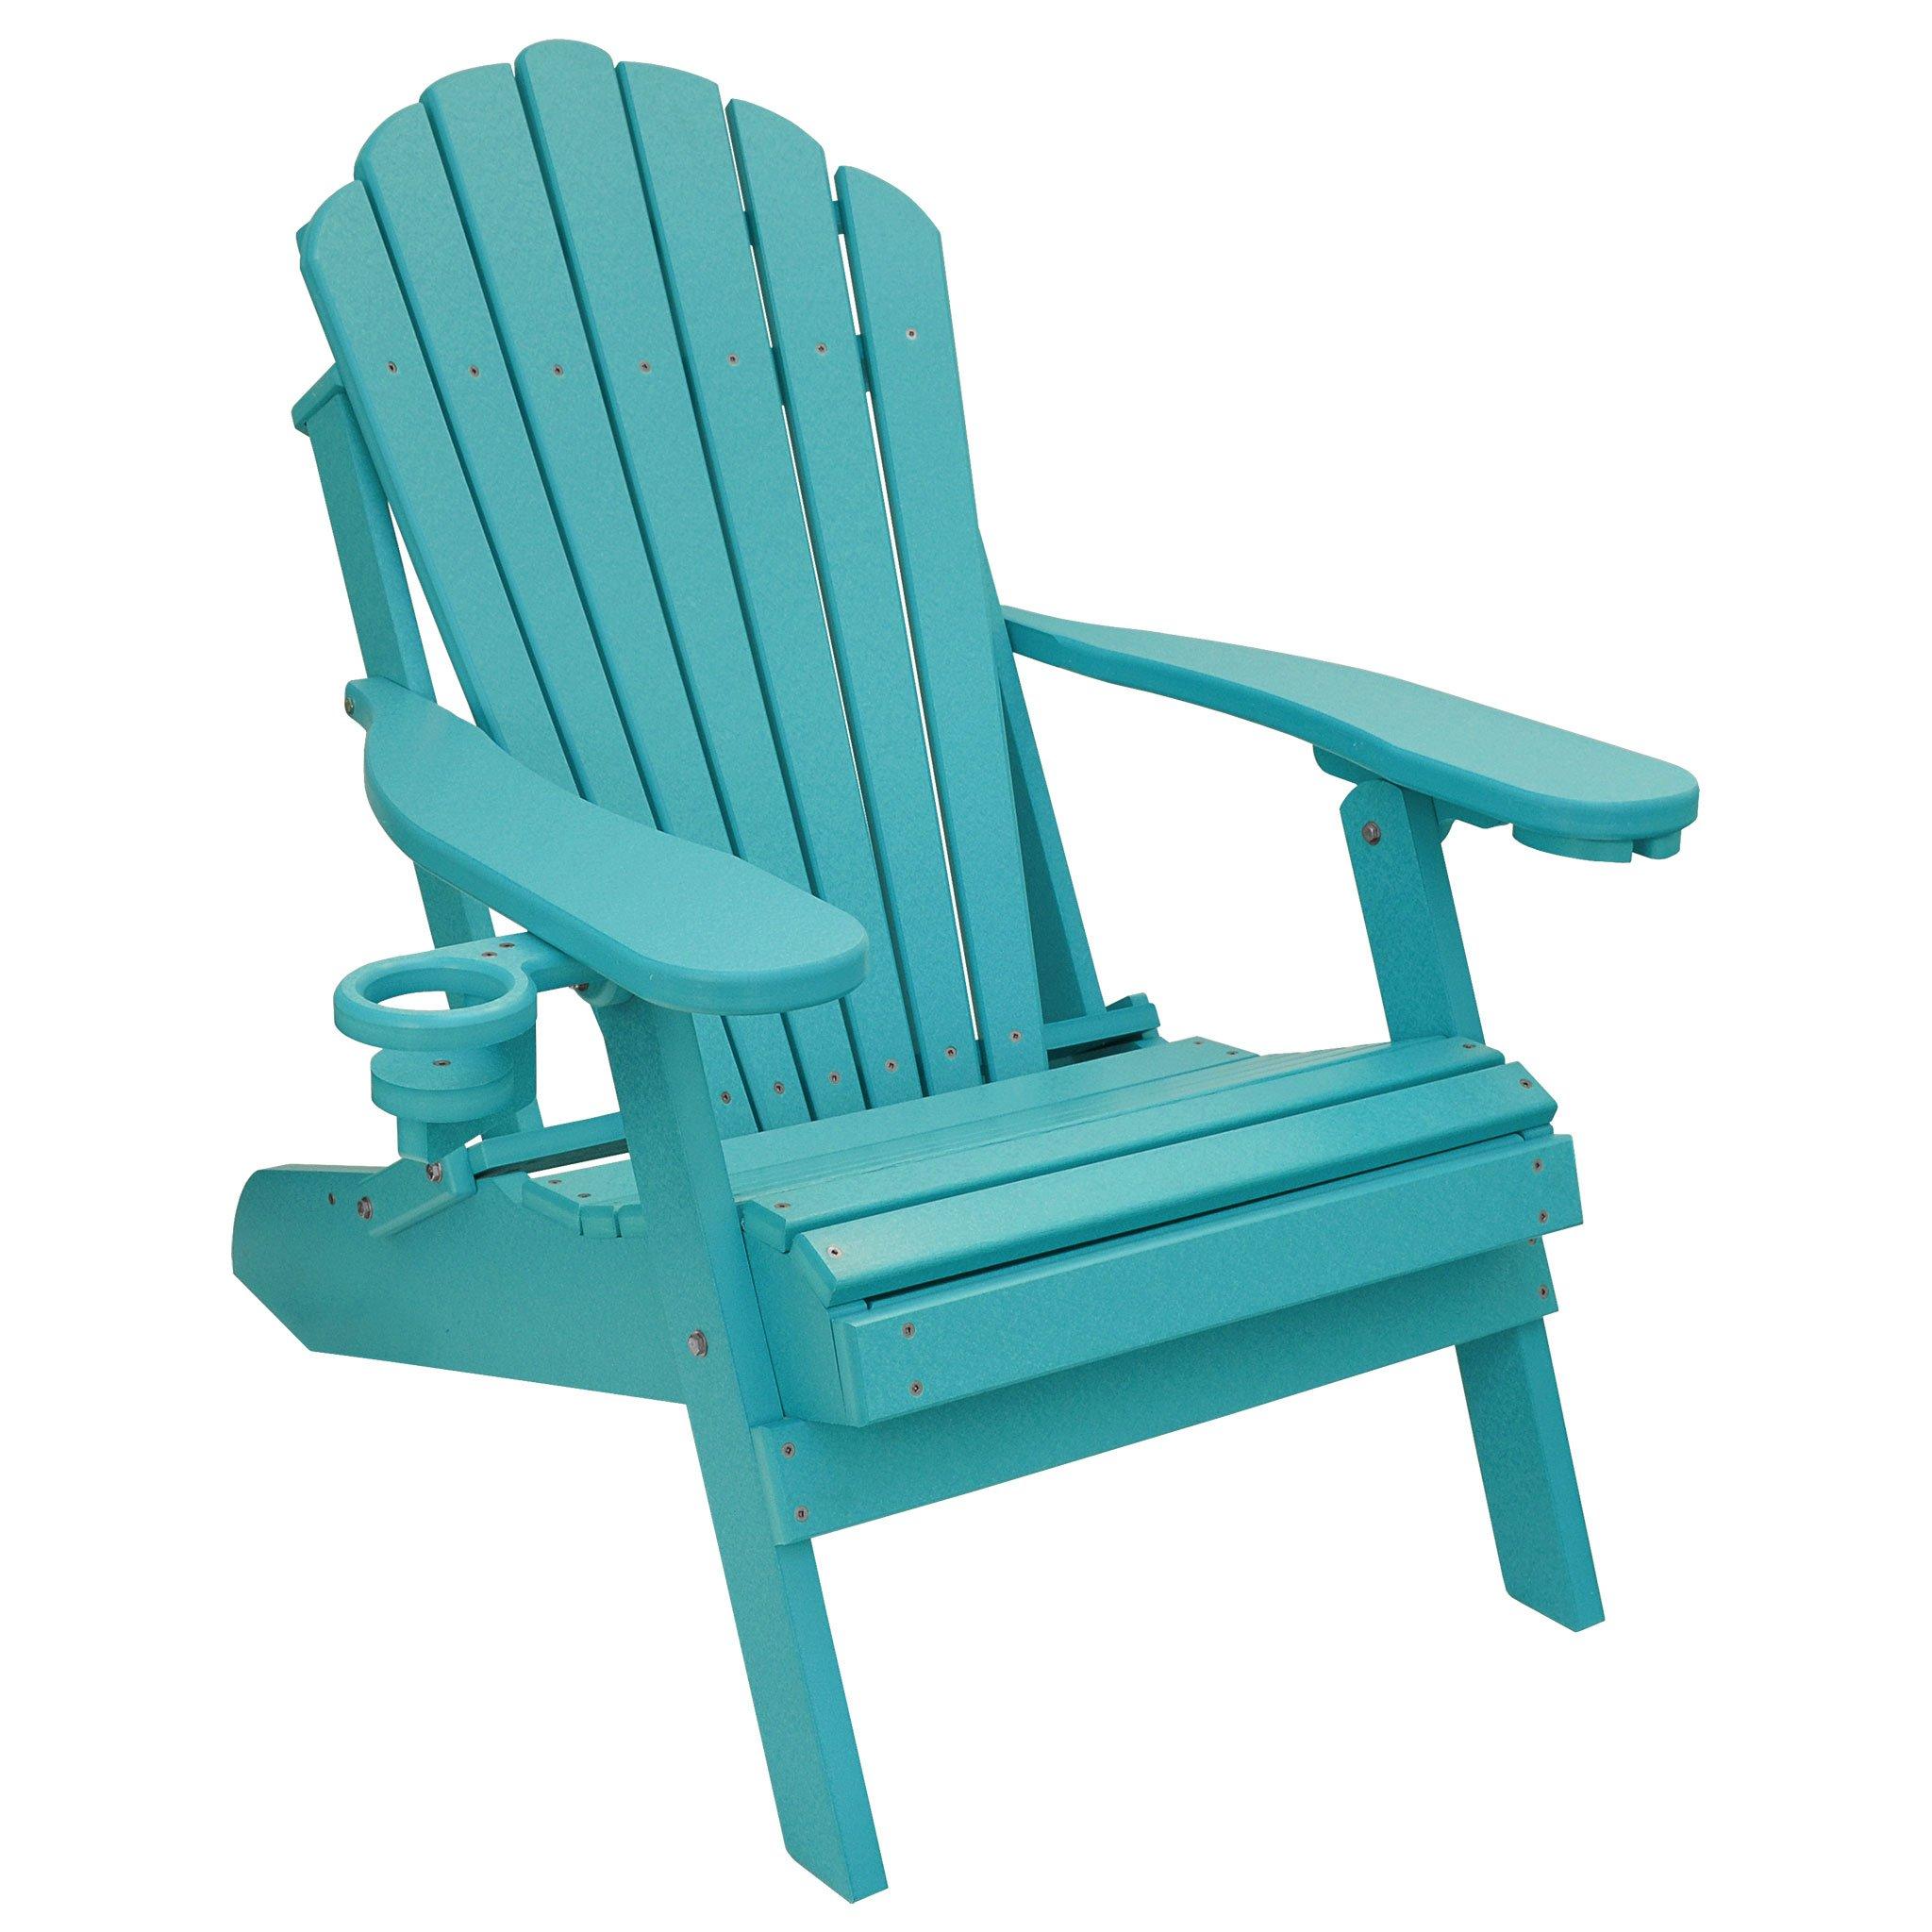 ECCB Outdoor Outer Banks Deluxe Oversized Poly Lumber Folding Adirondack Chair (Aruba Blue)